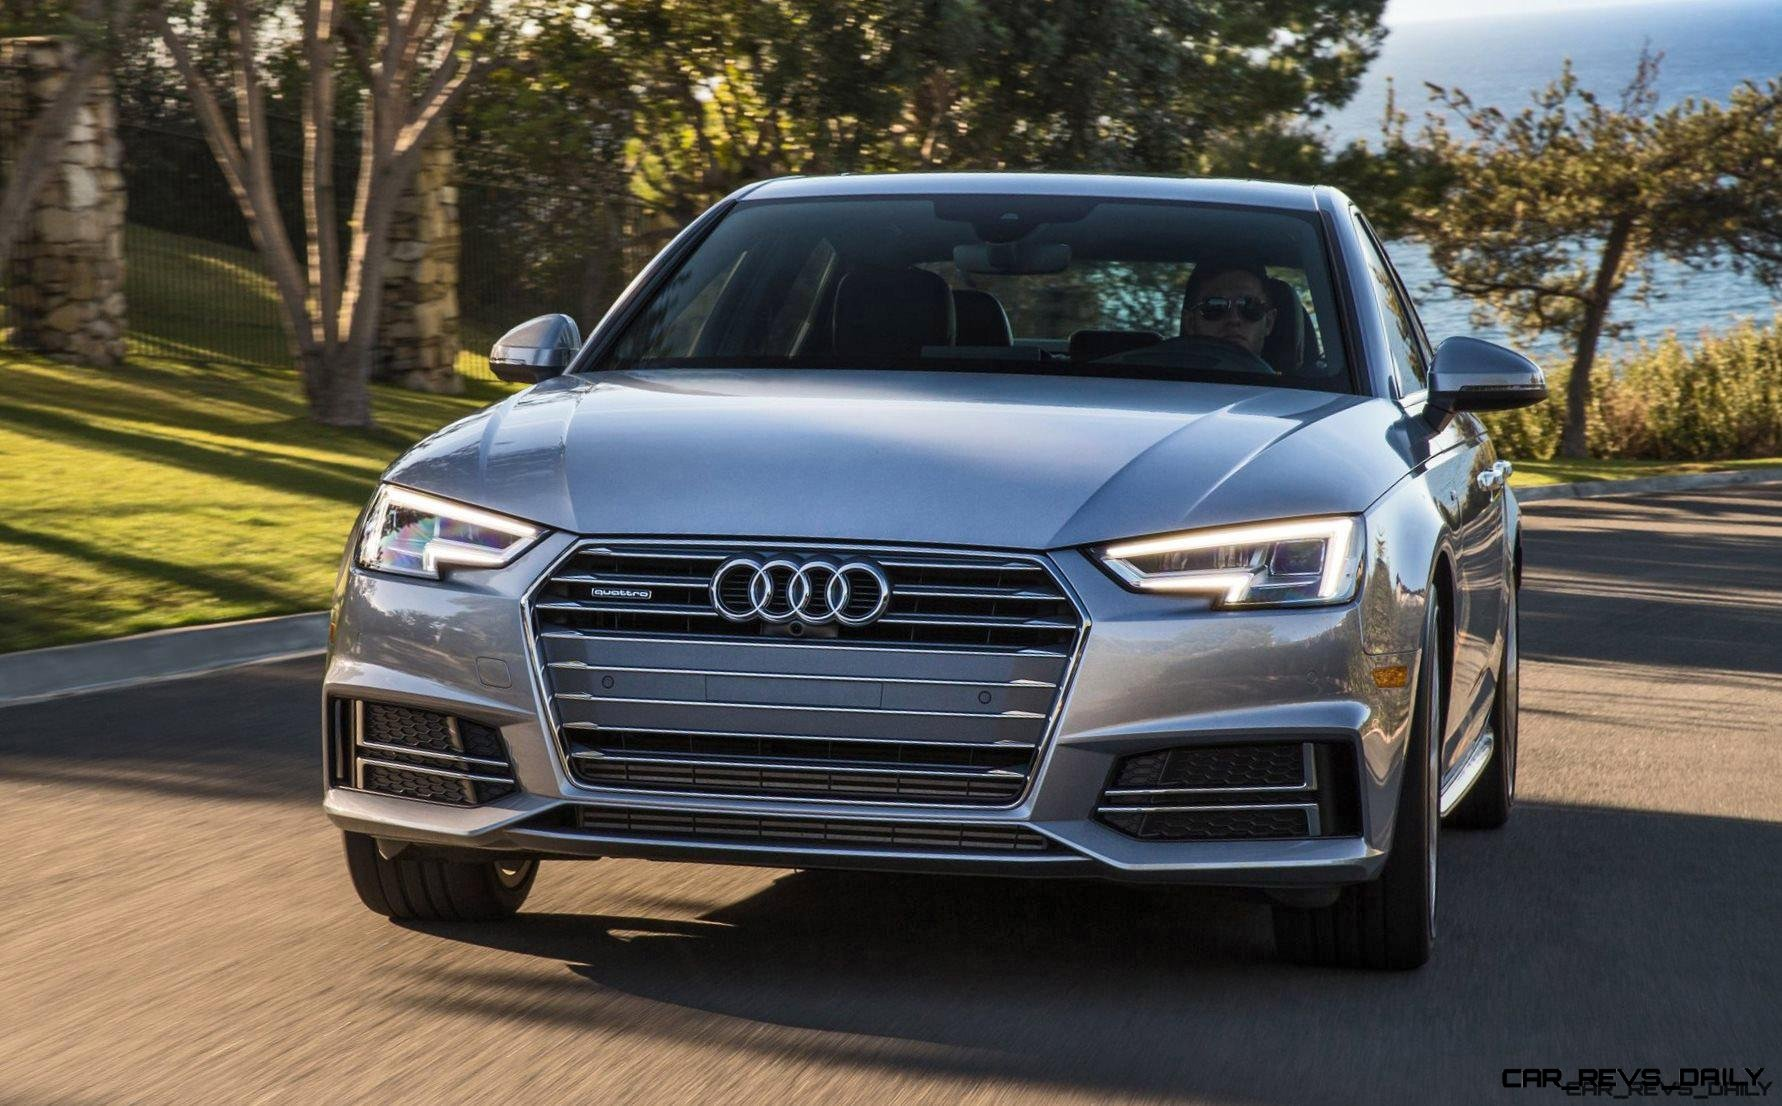 2017 audi a4 quattro - road test review -ben lewis » car shopping